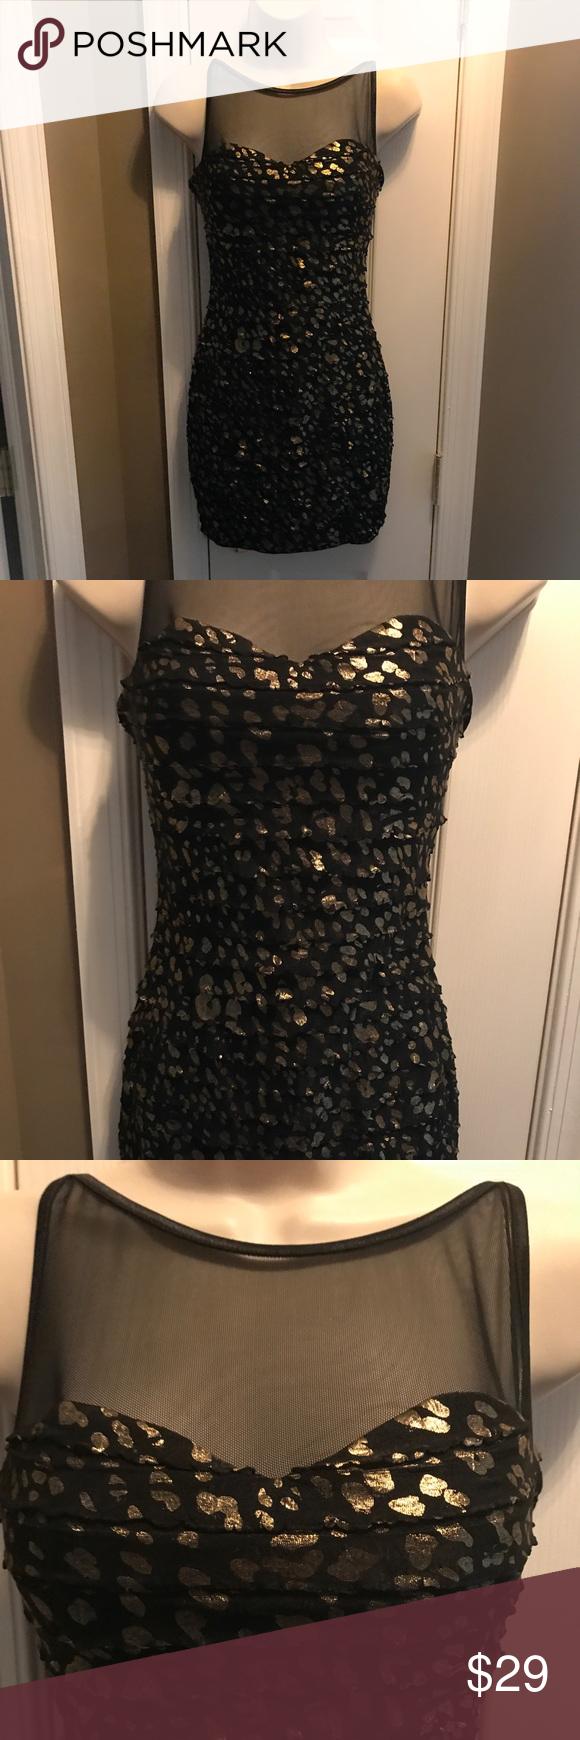 Body Central Sale >> Sale Body Central Black Gold Dress Body Central